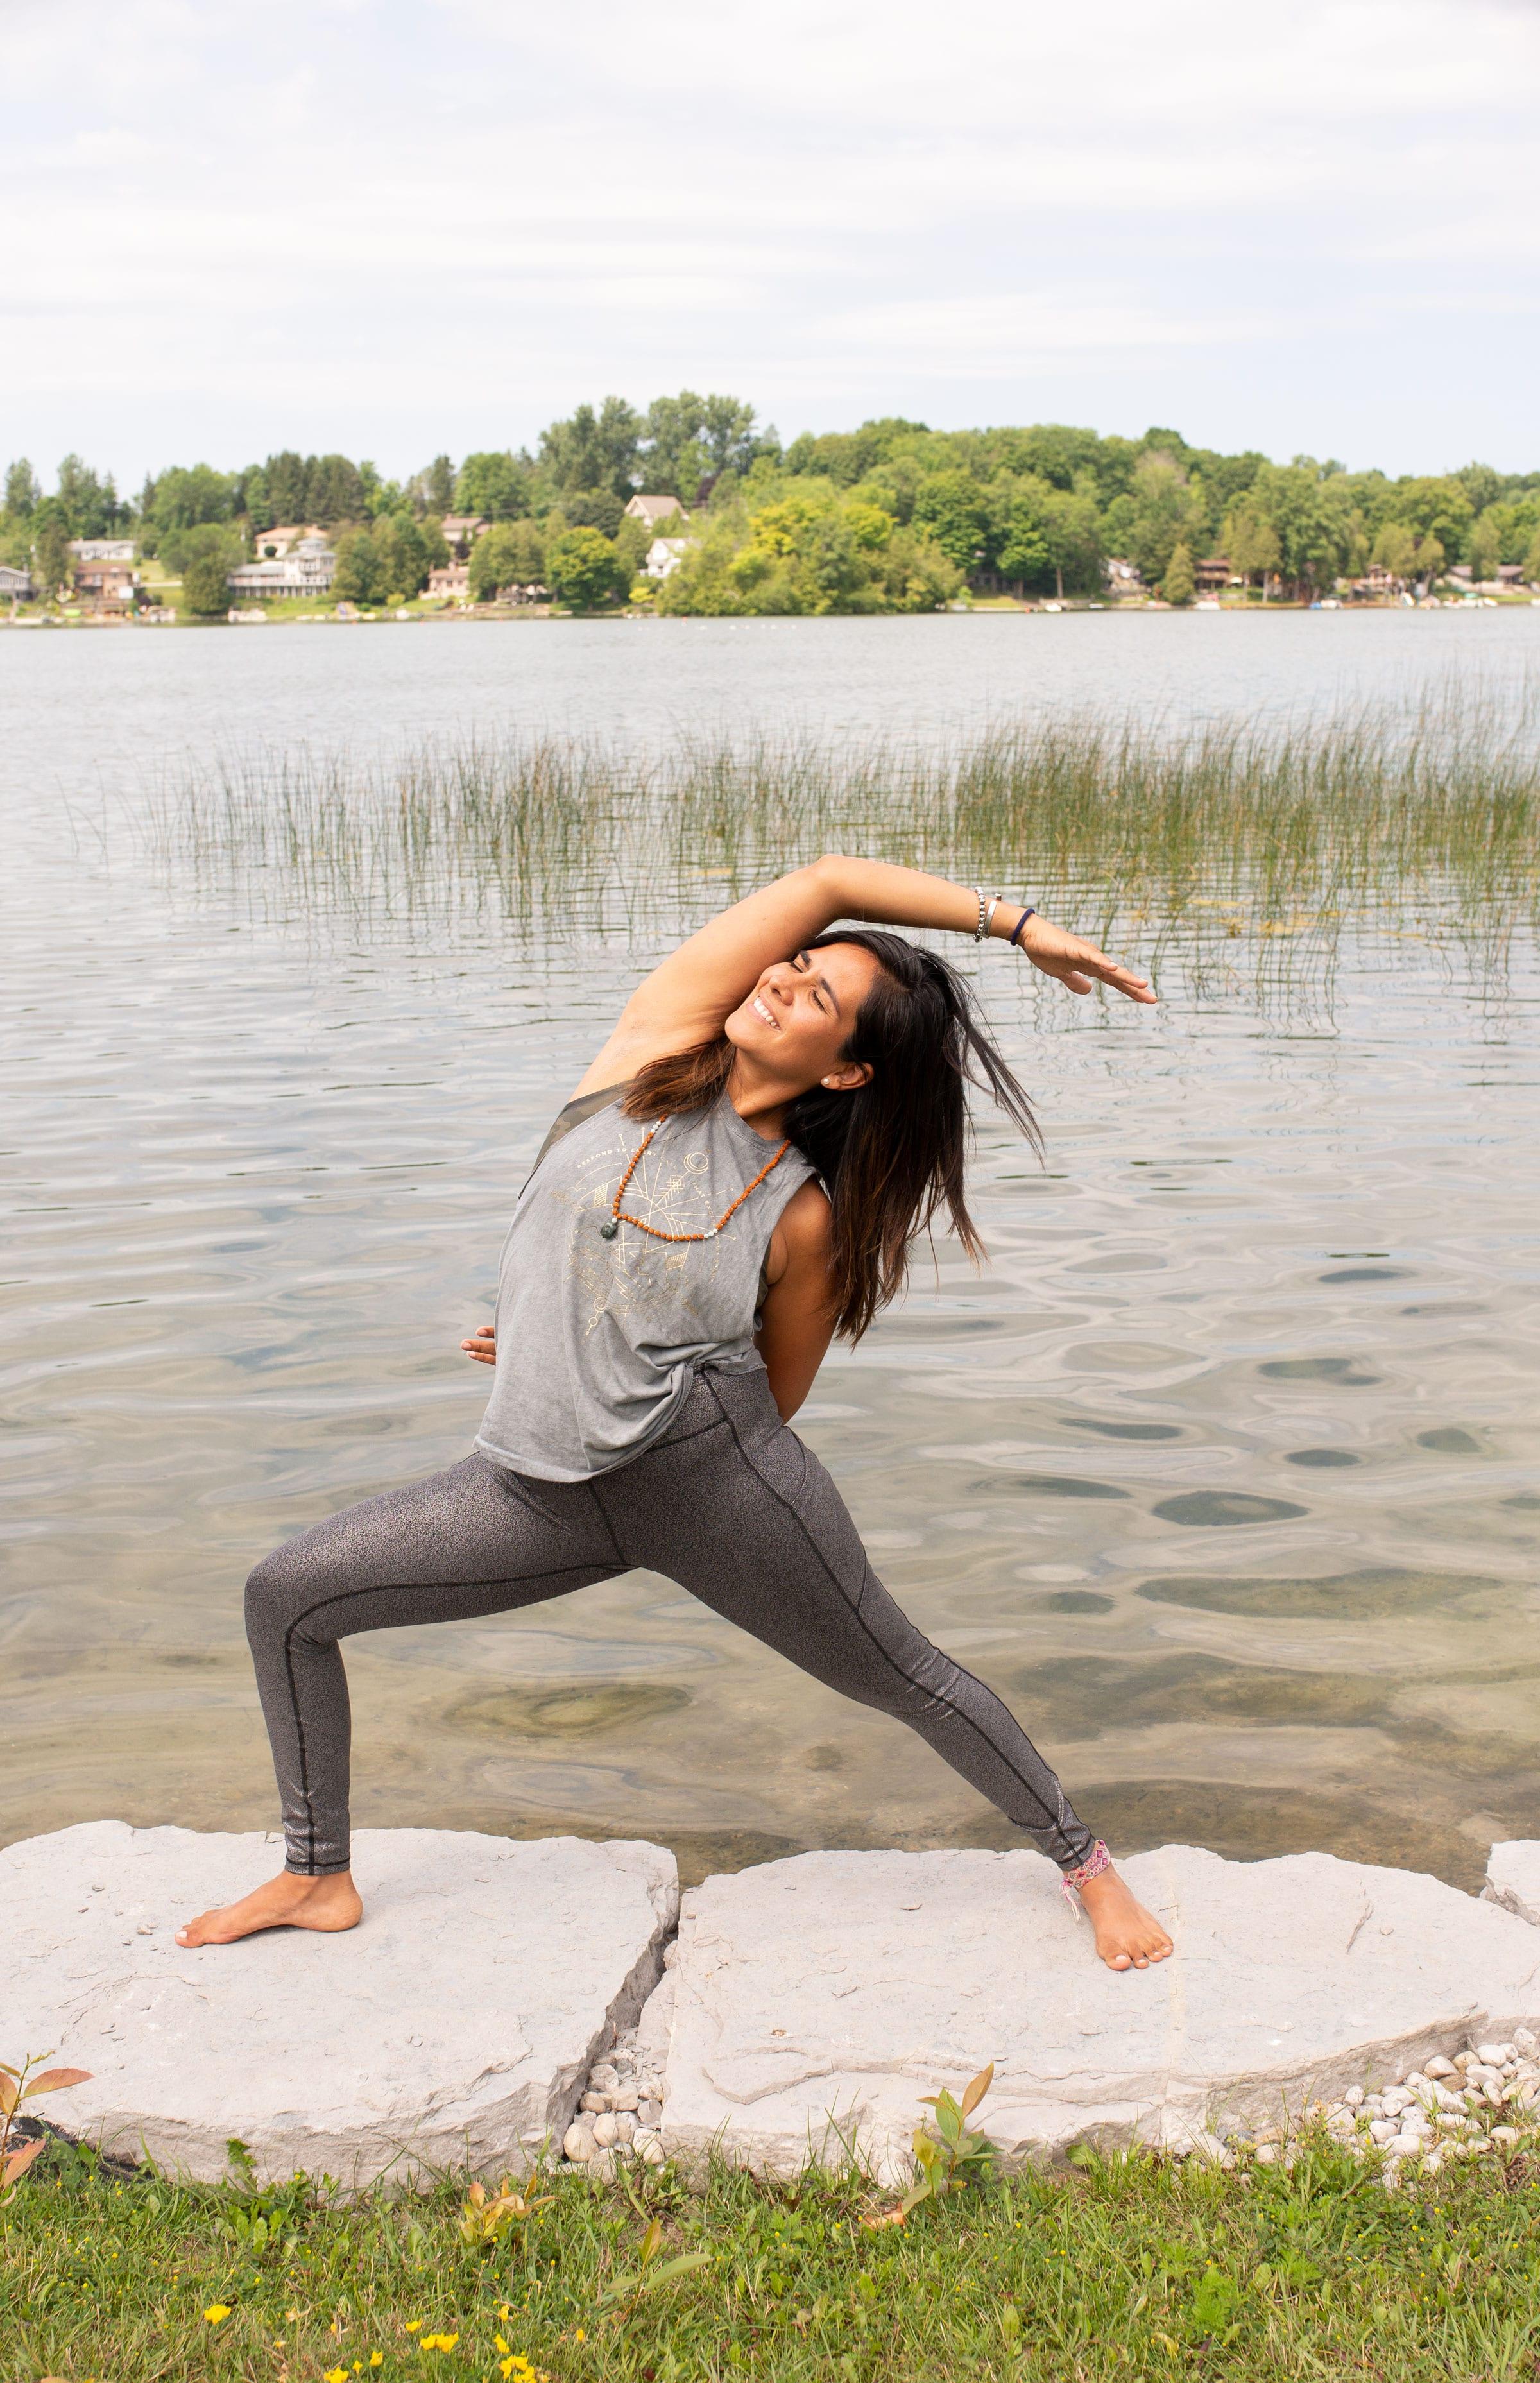 Jen-Hibberd-Yoga-Barn-Hanover-Photographer